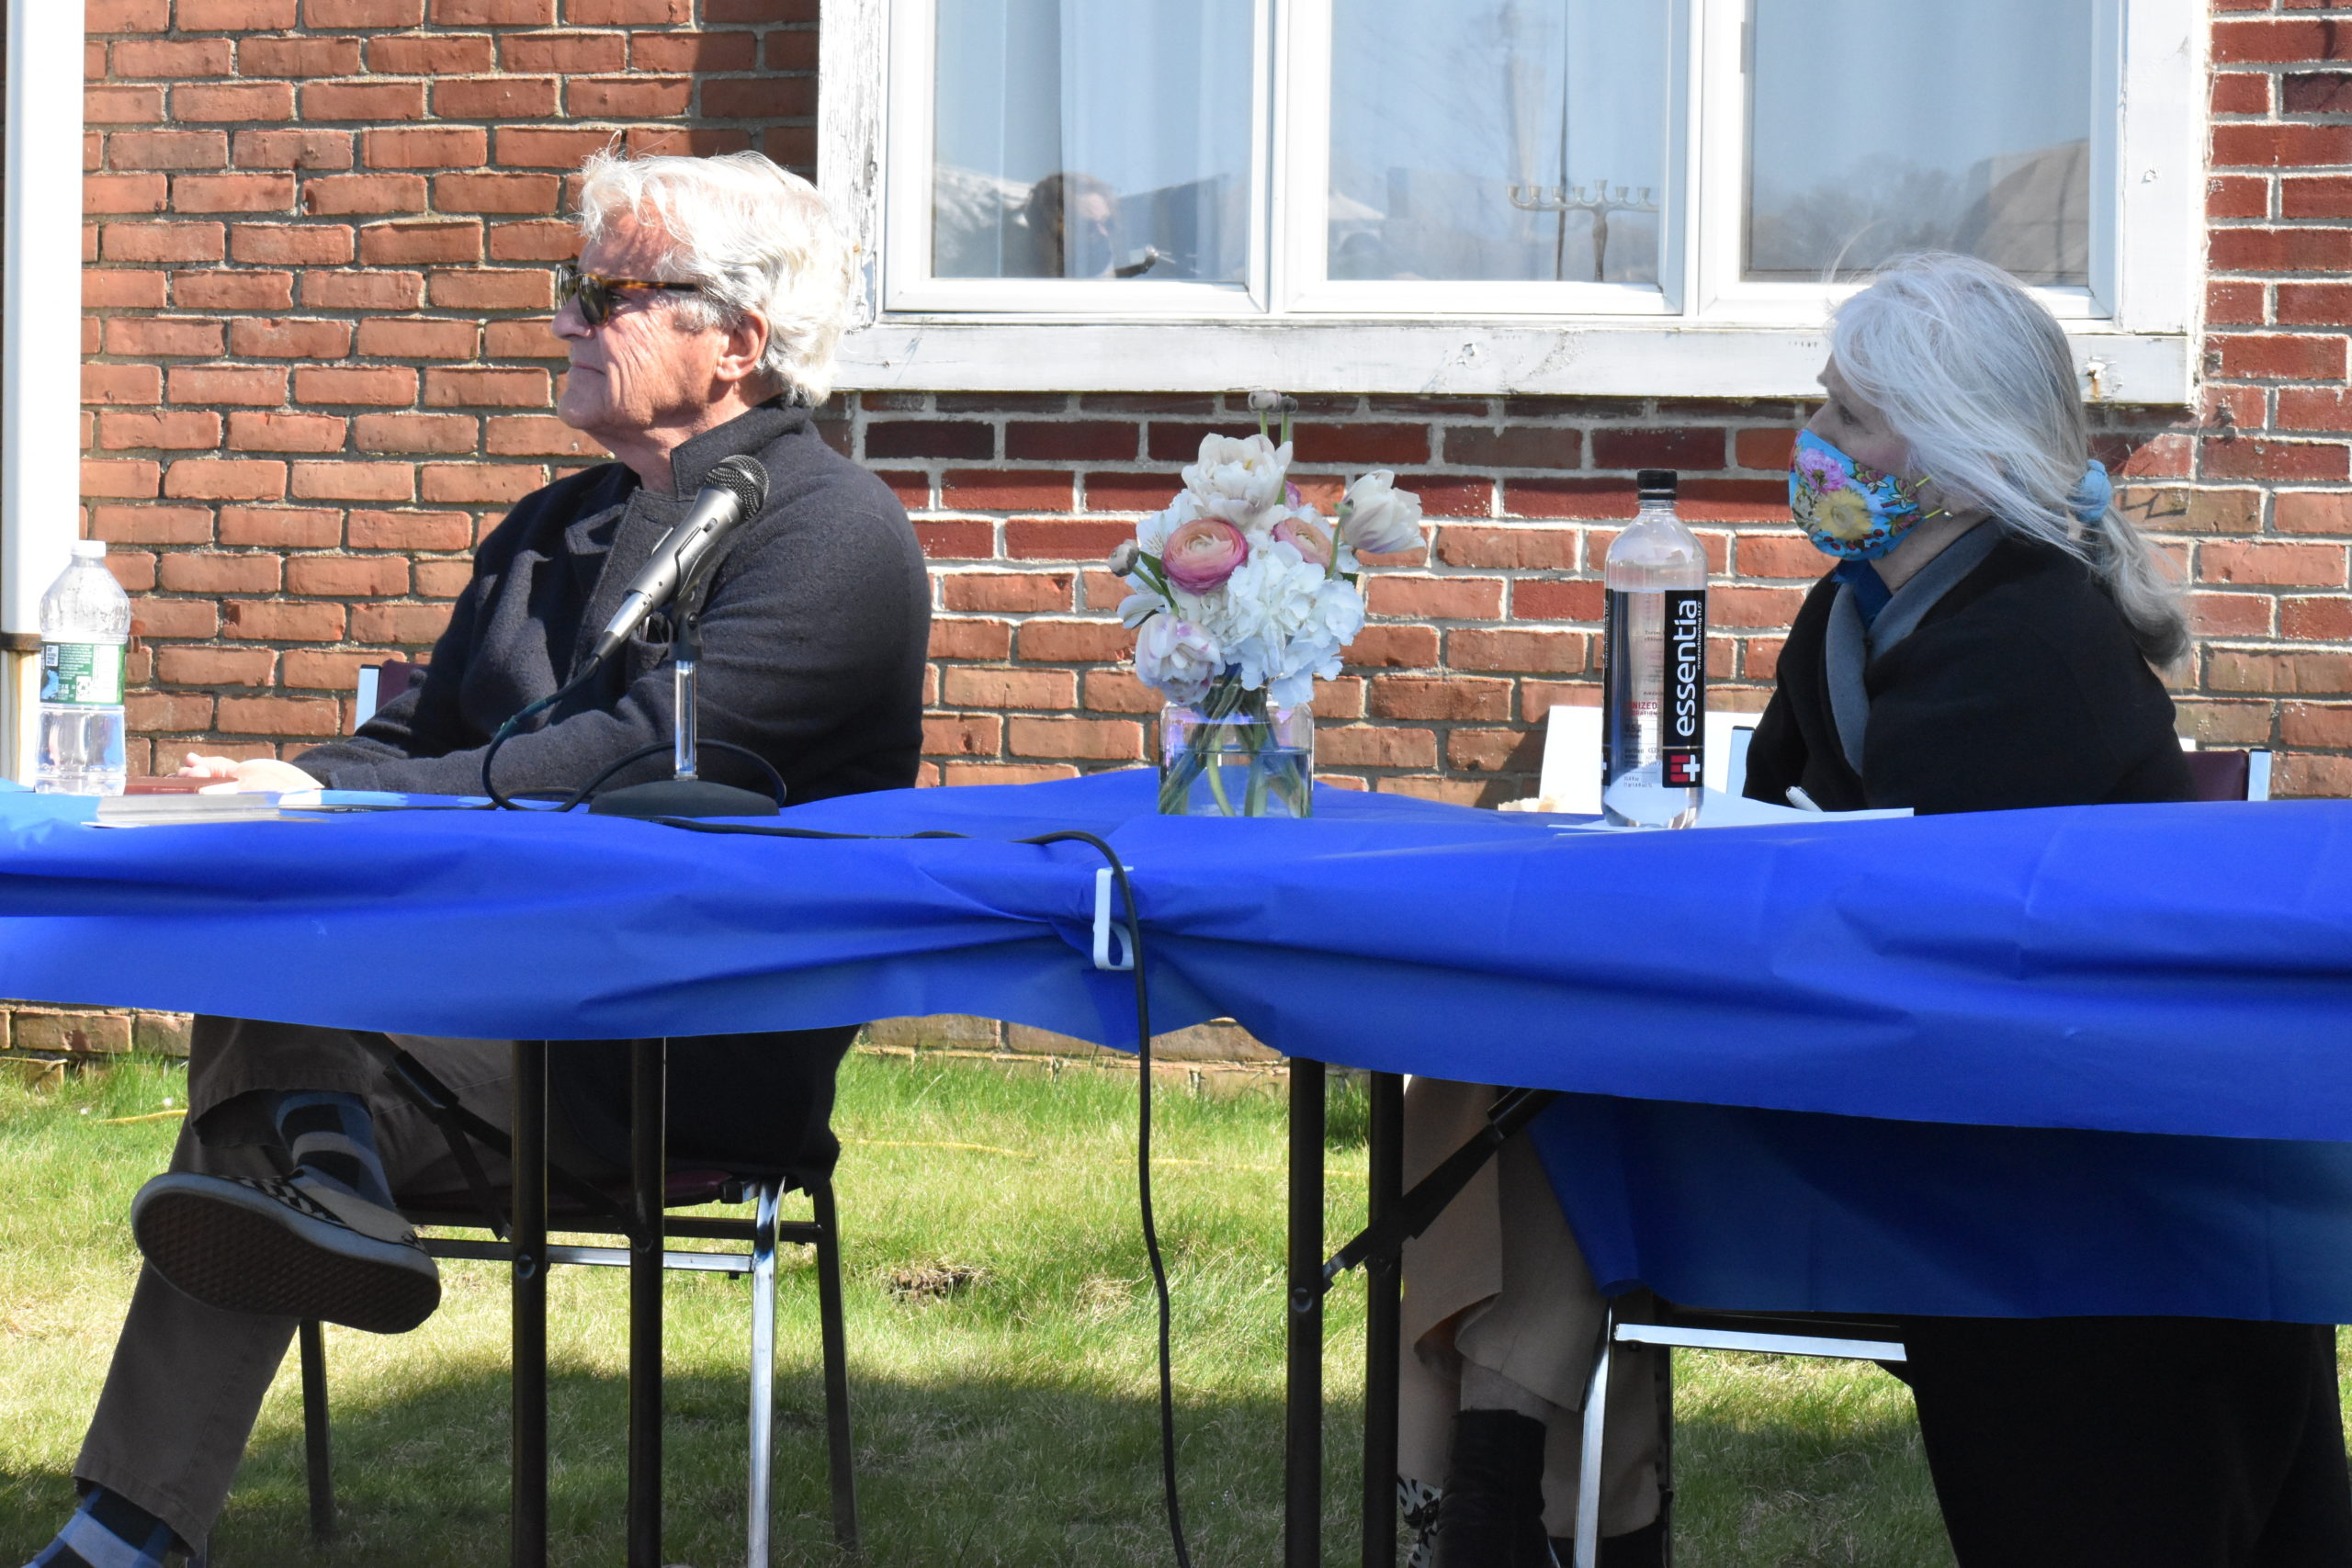 Sag Harbor Trustee James Larocca and Mayor Kathleen Mulcahy listen to comments at Friday's forum on waterfront development. STEPHEN J. KOTZ